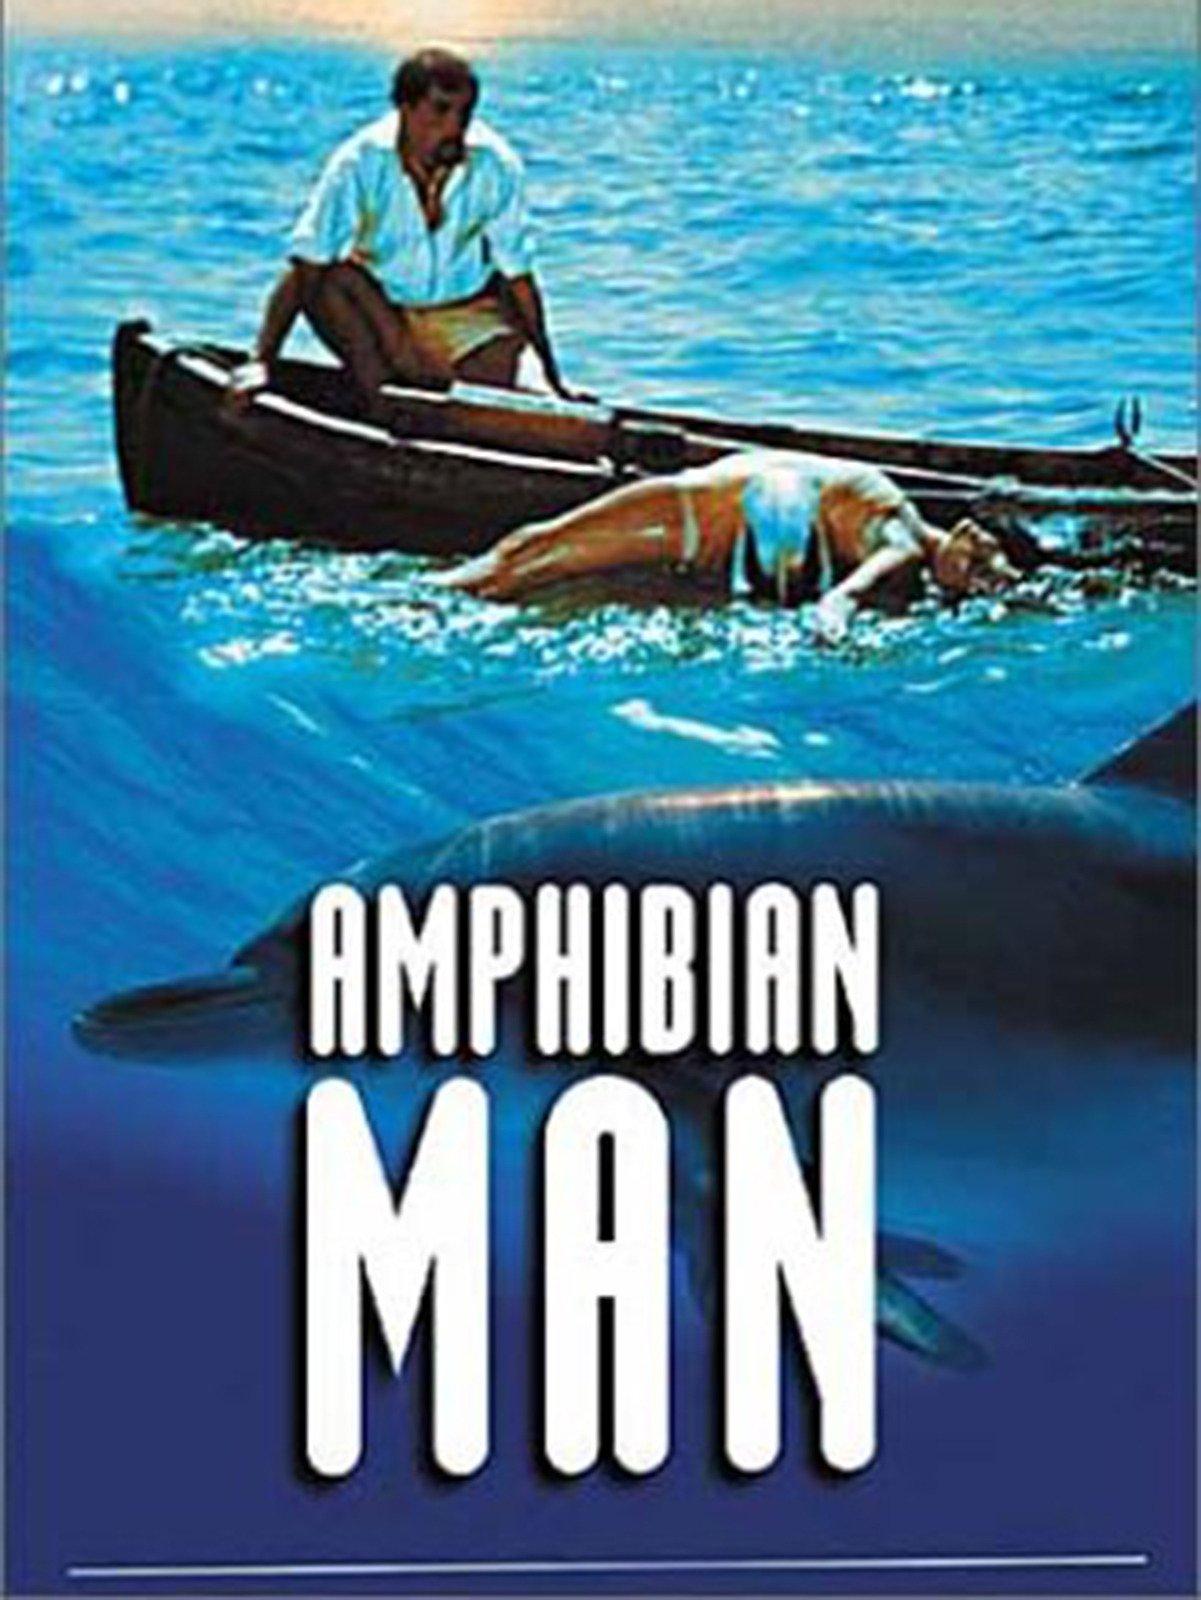 Amphibian Man